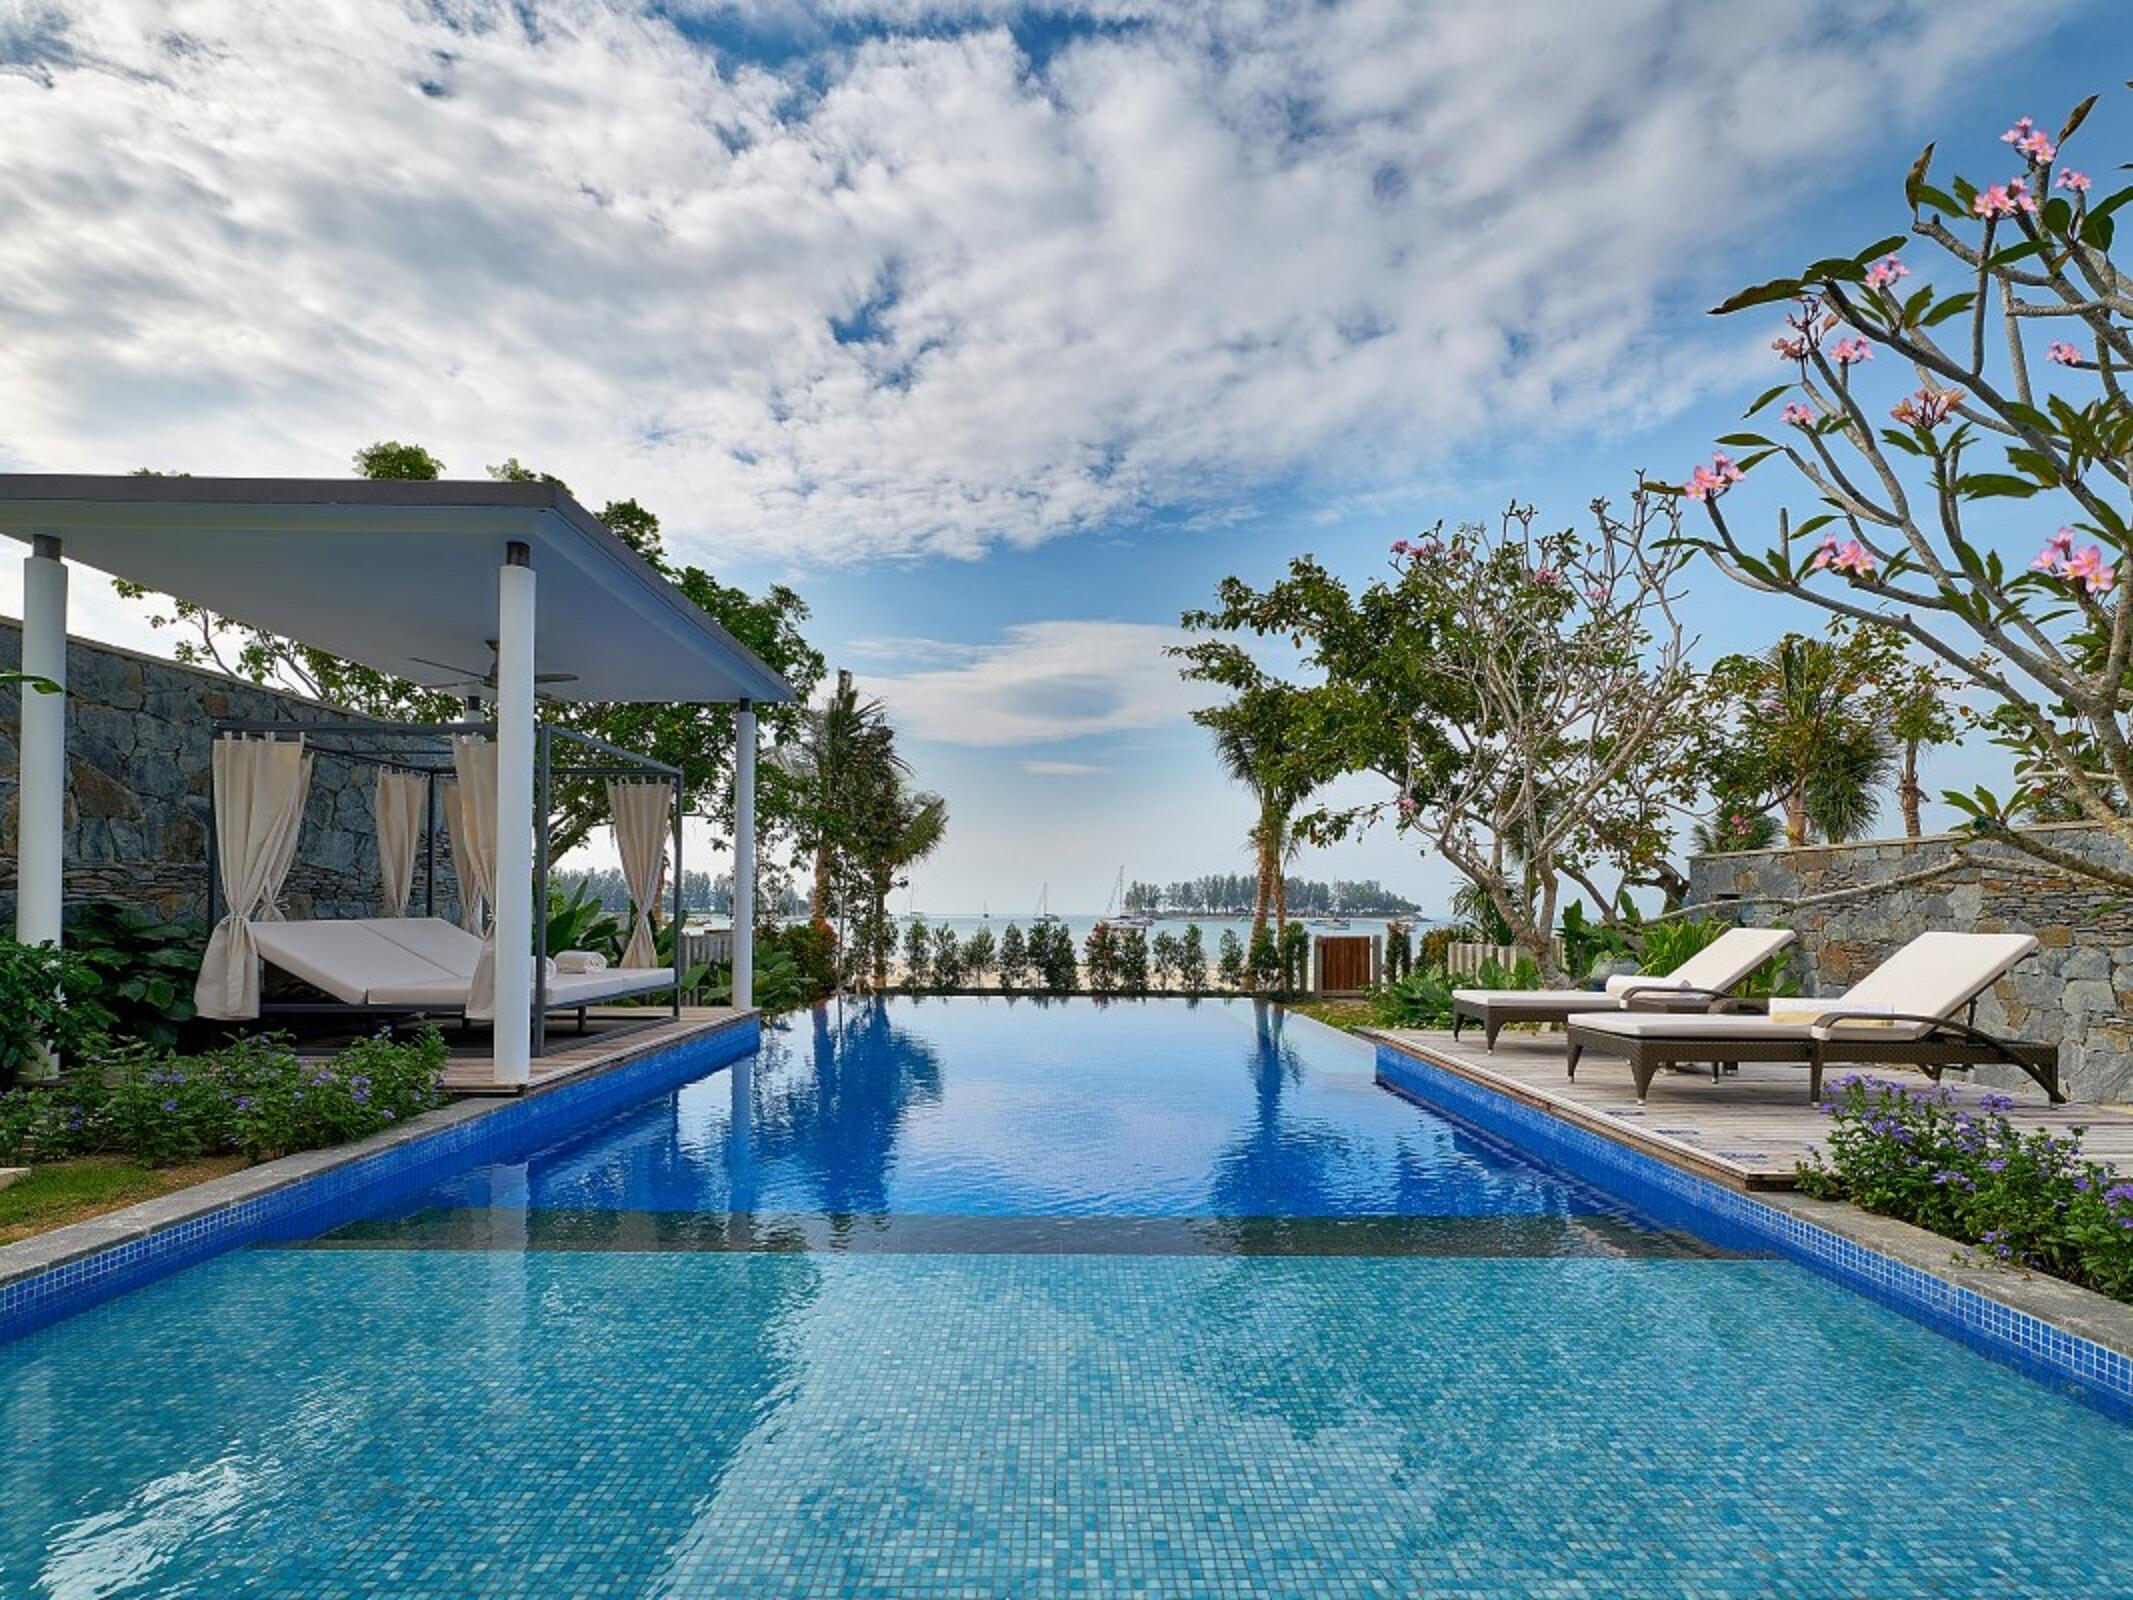 Beautiful exterior pool view